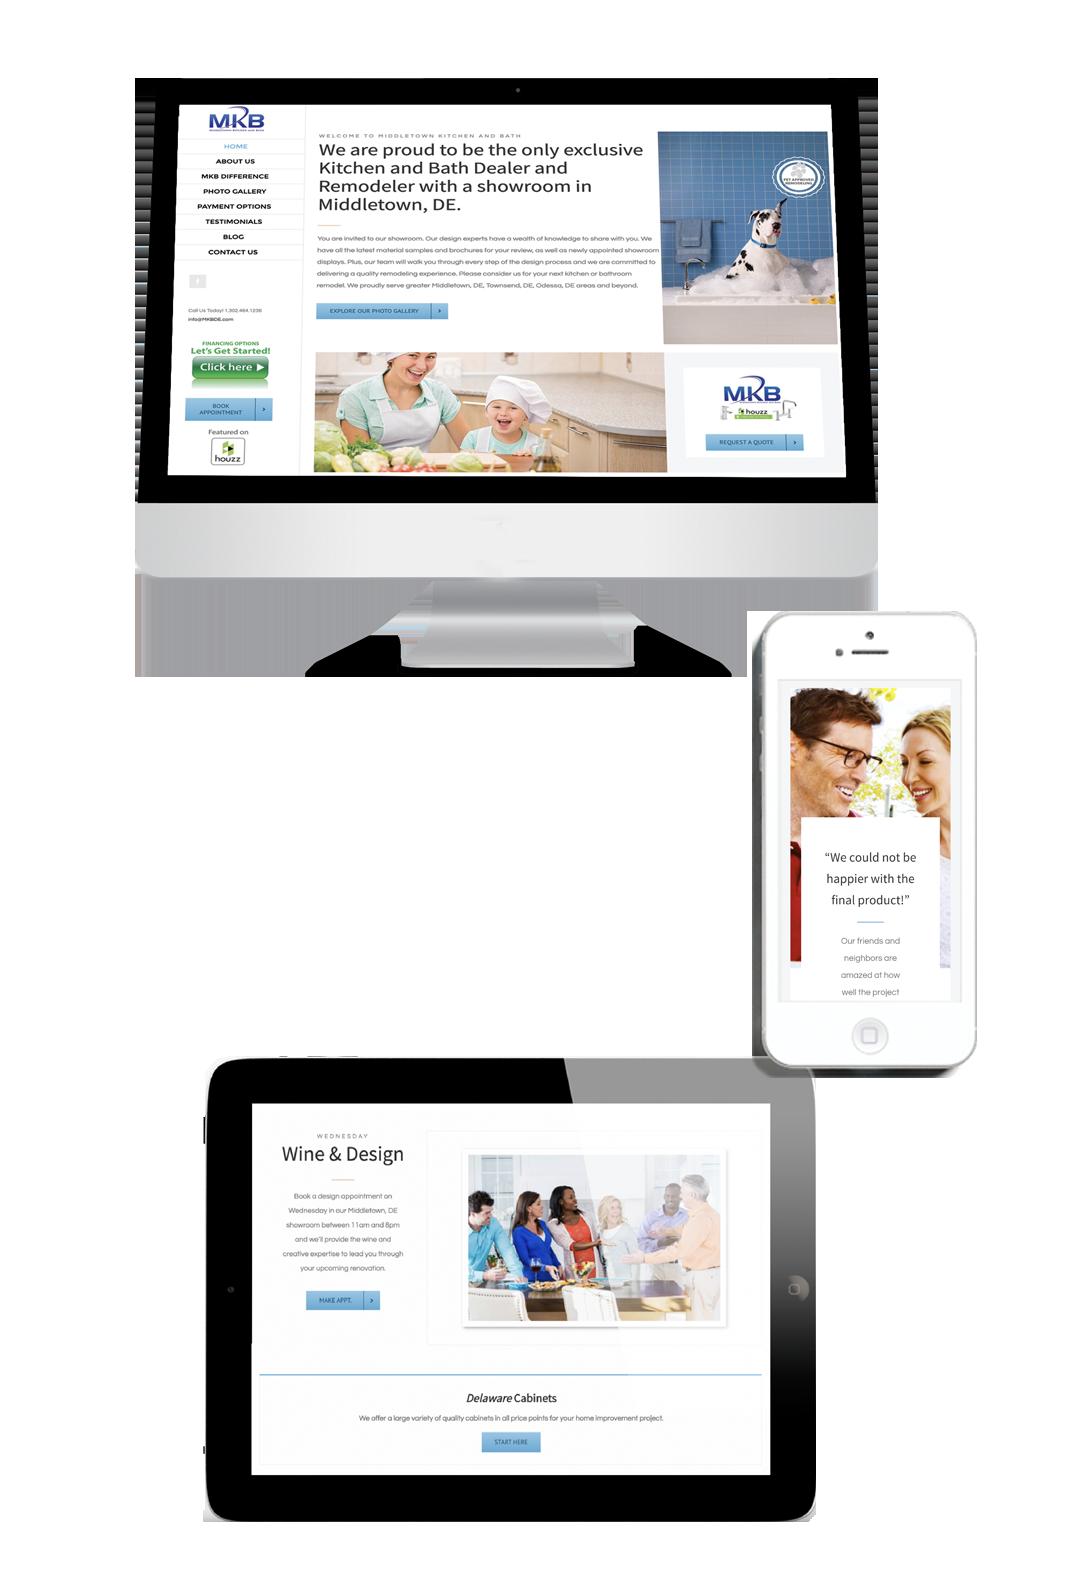 iKANDE web design MKBDE